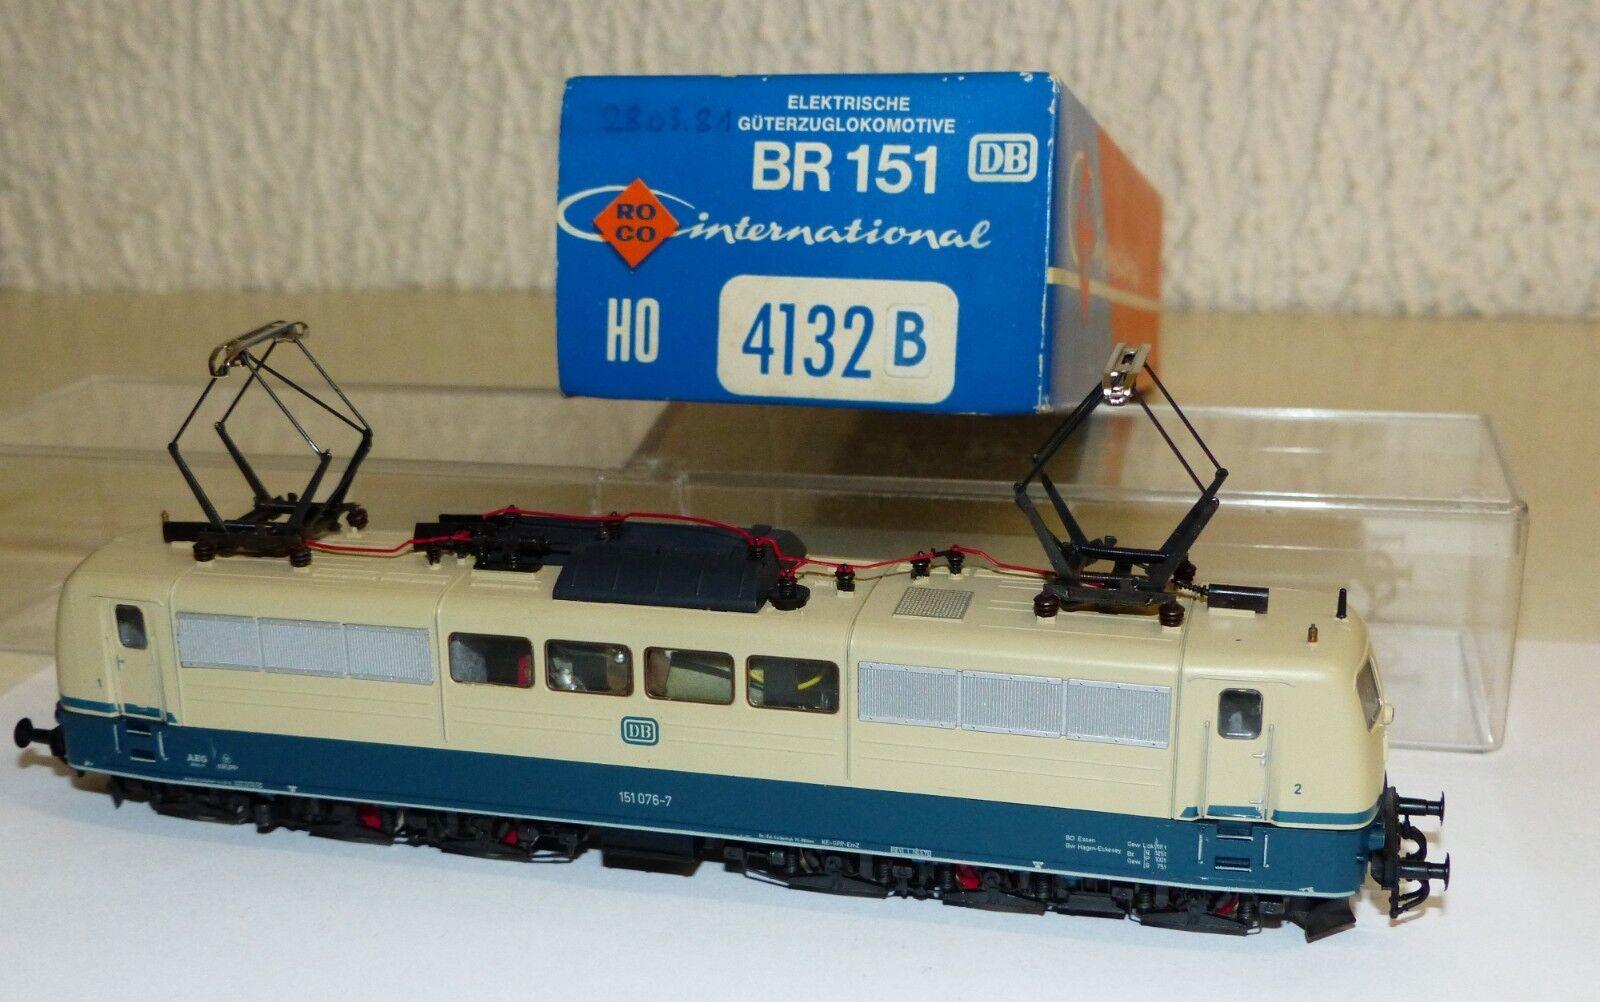 Roco 4132 B E-Lok BR 151 076-7 DB OVP H0 1 87 guter Zustand Elektrolok